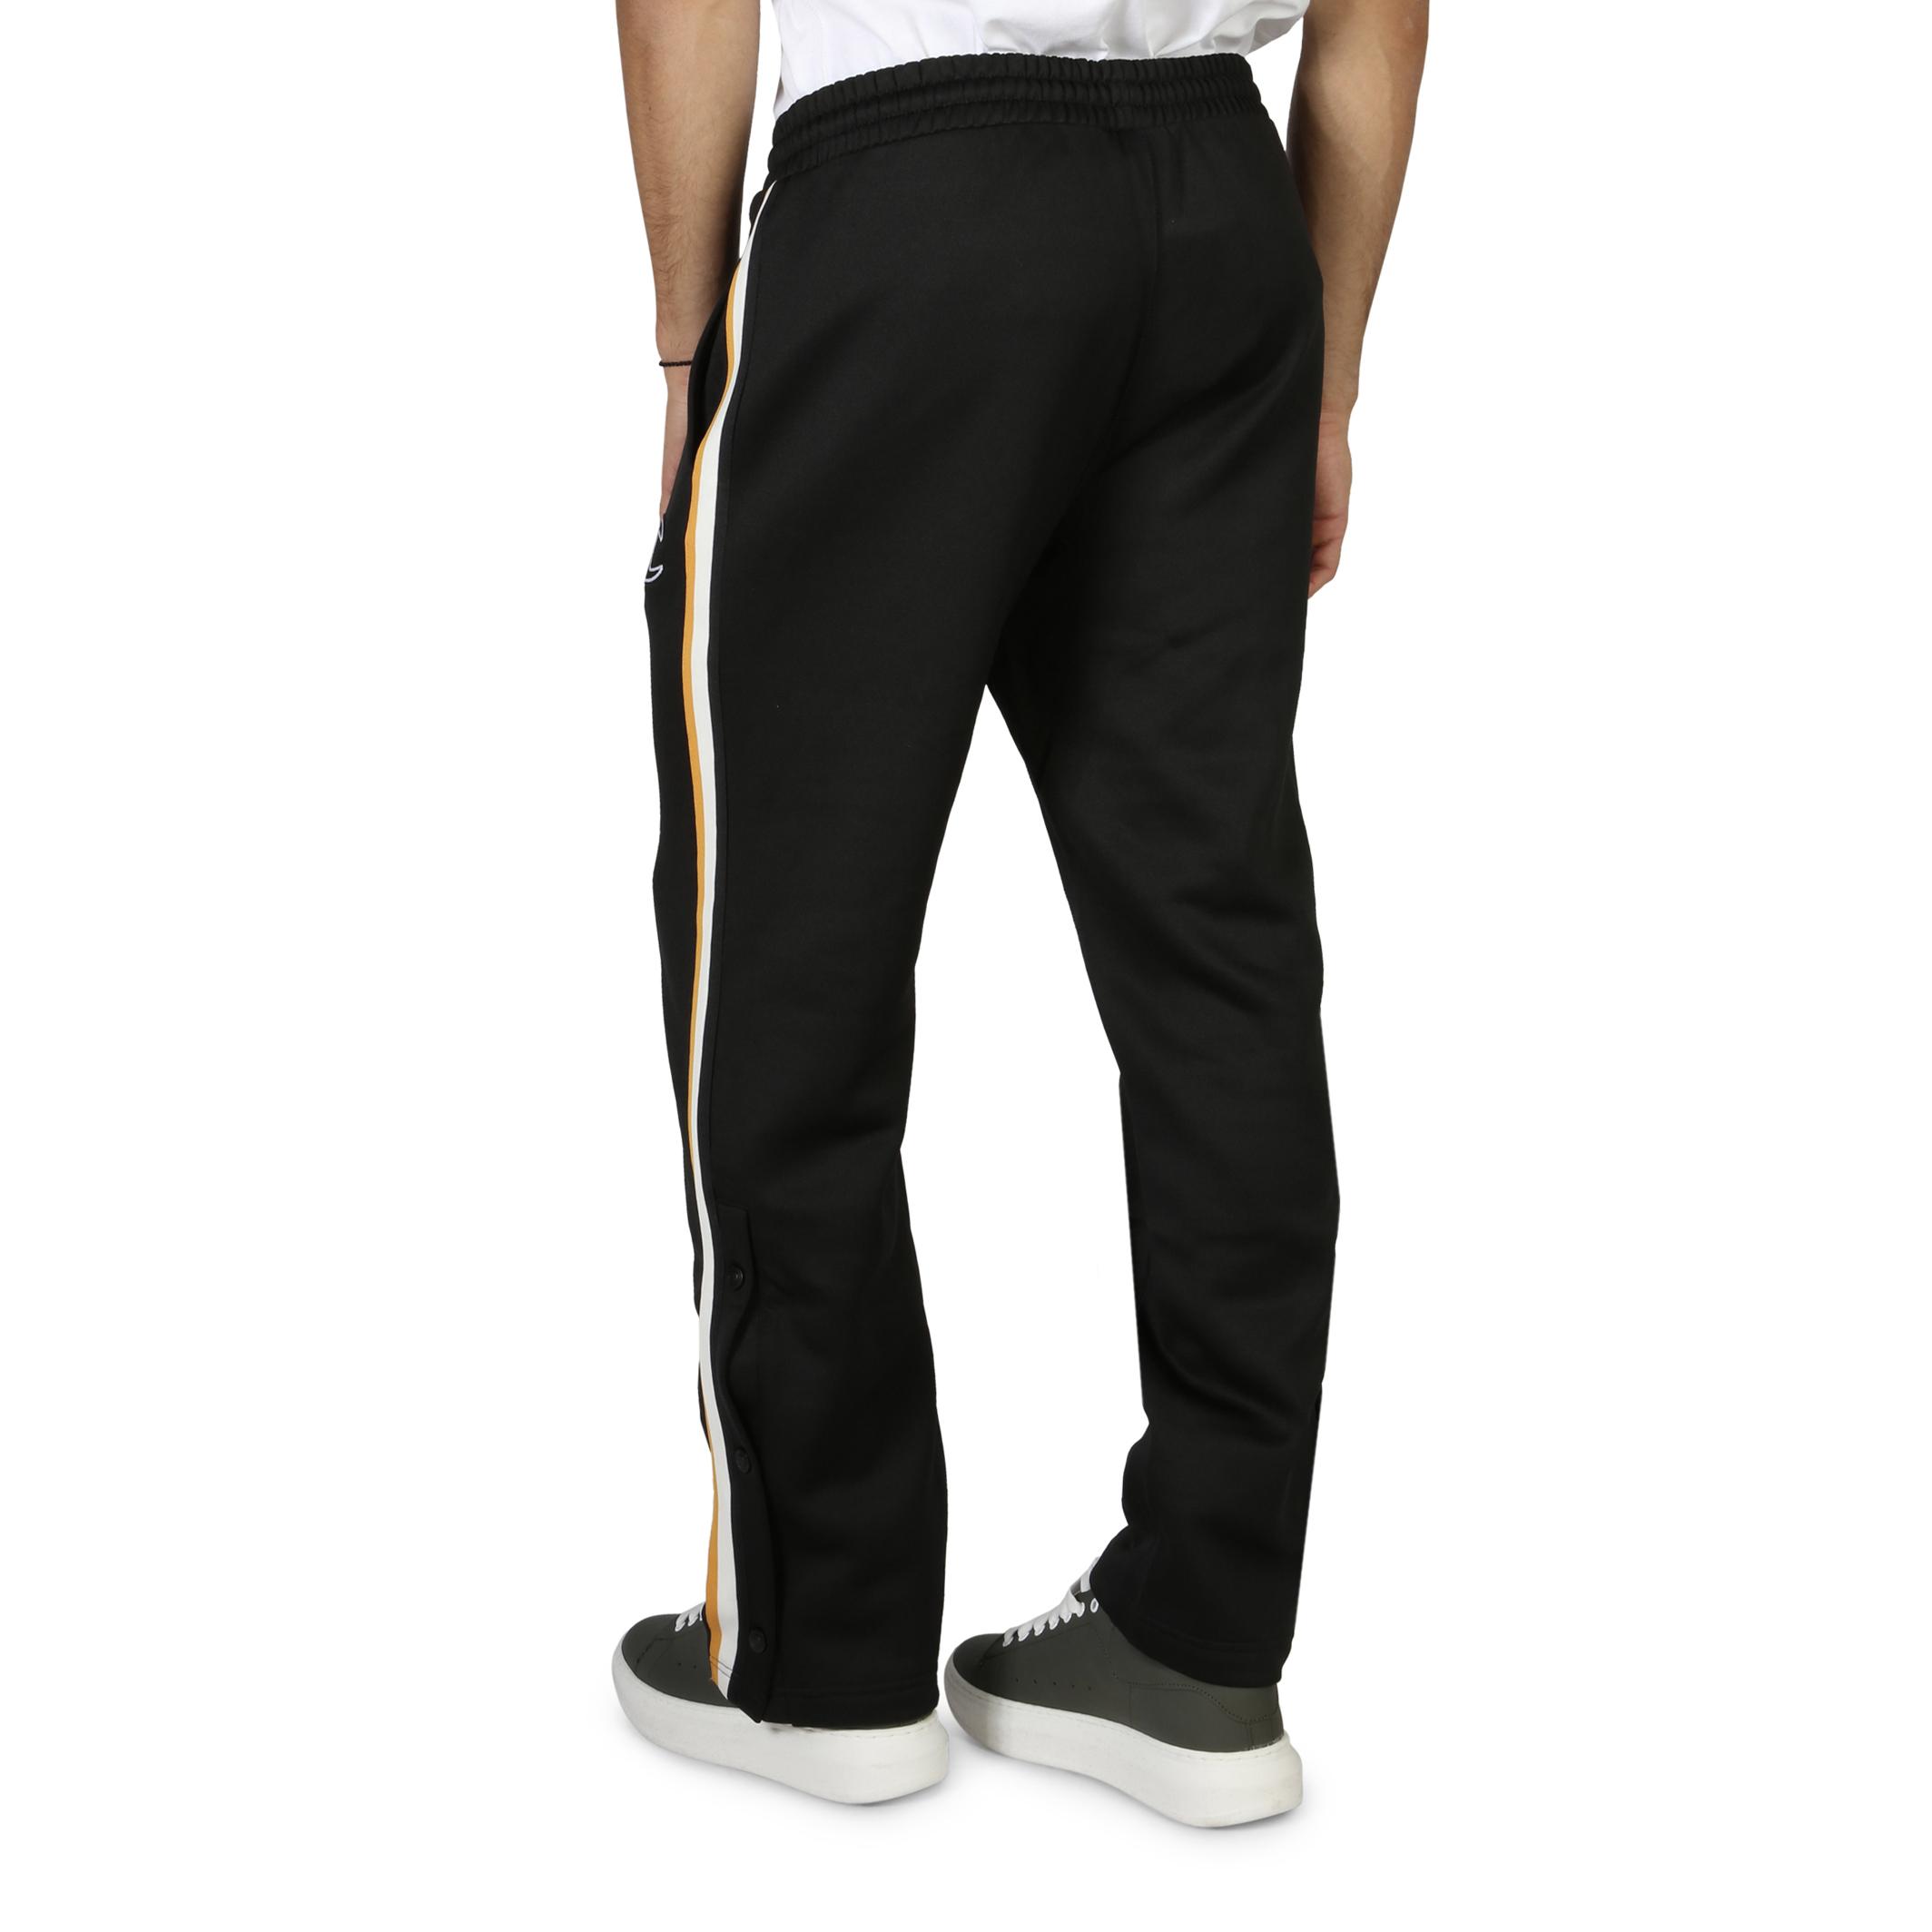 Pantalon de jogging Champion – 213533